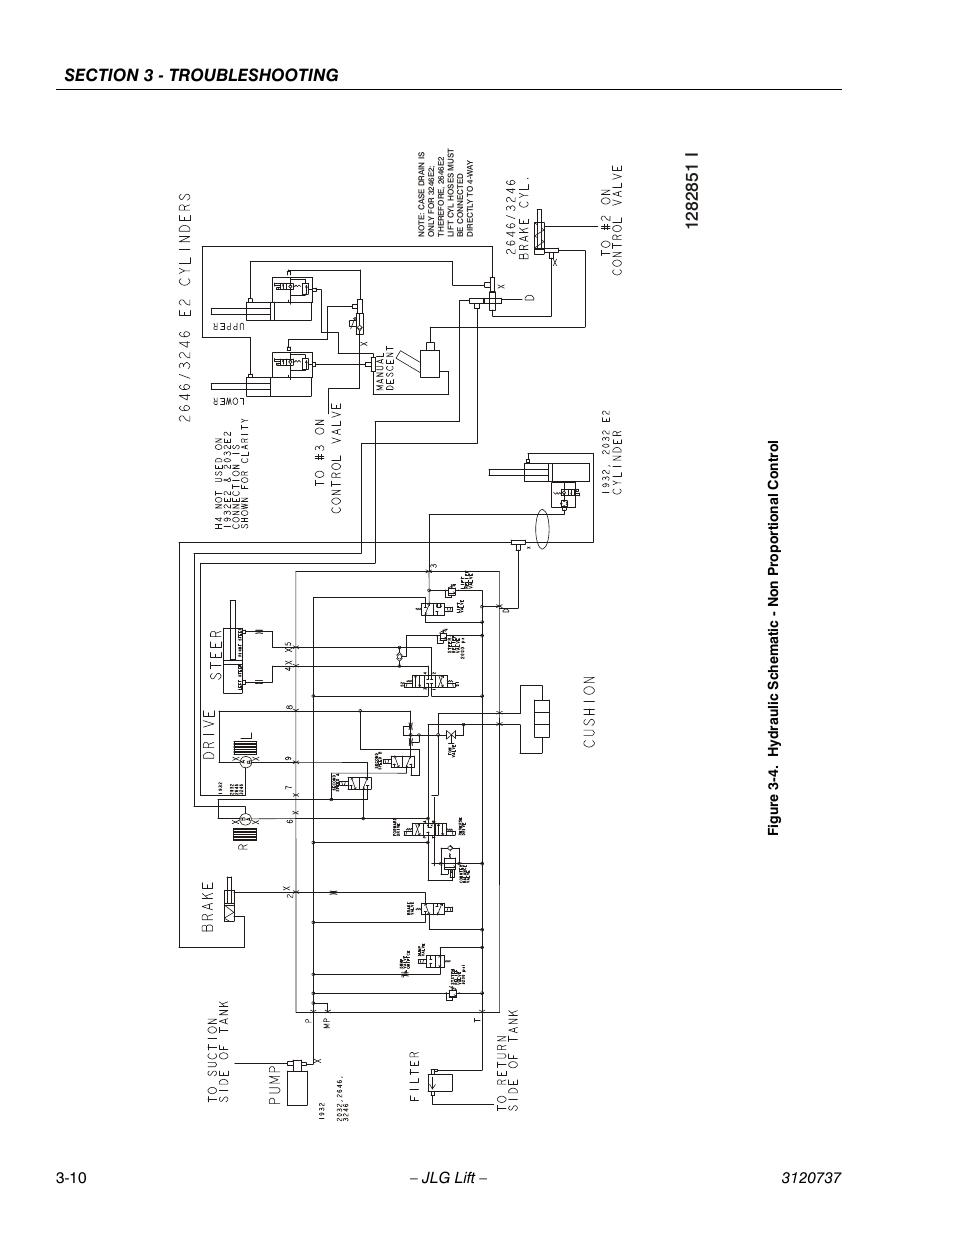 medium resolution of jlg 3246 wiring diagram wiring diagramsjlg 3246 wiring diagram wiring diagram automotivejlg 2032e2 wiring diagram schematic